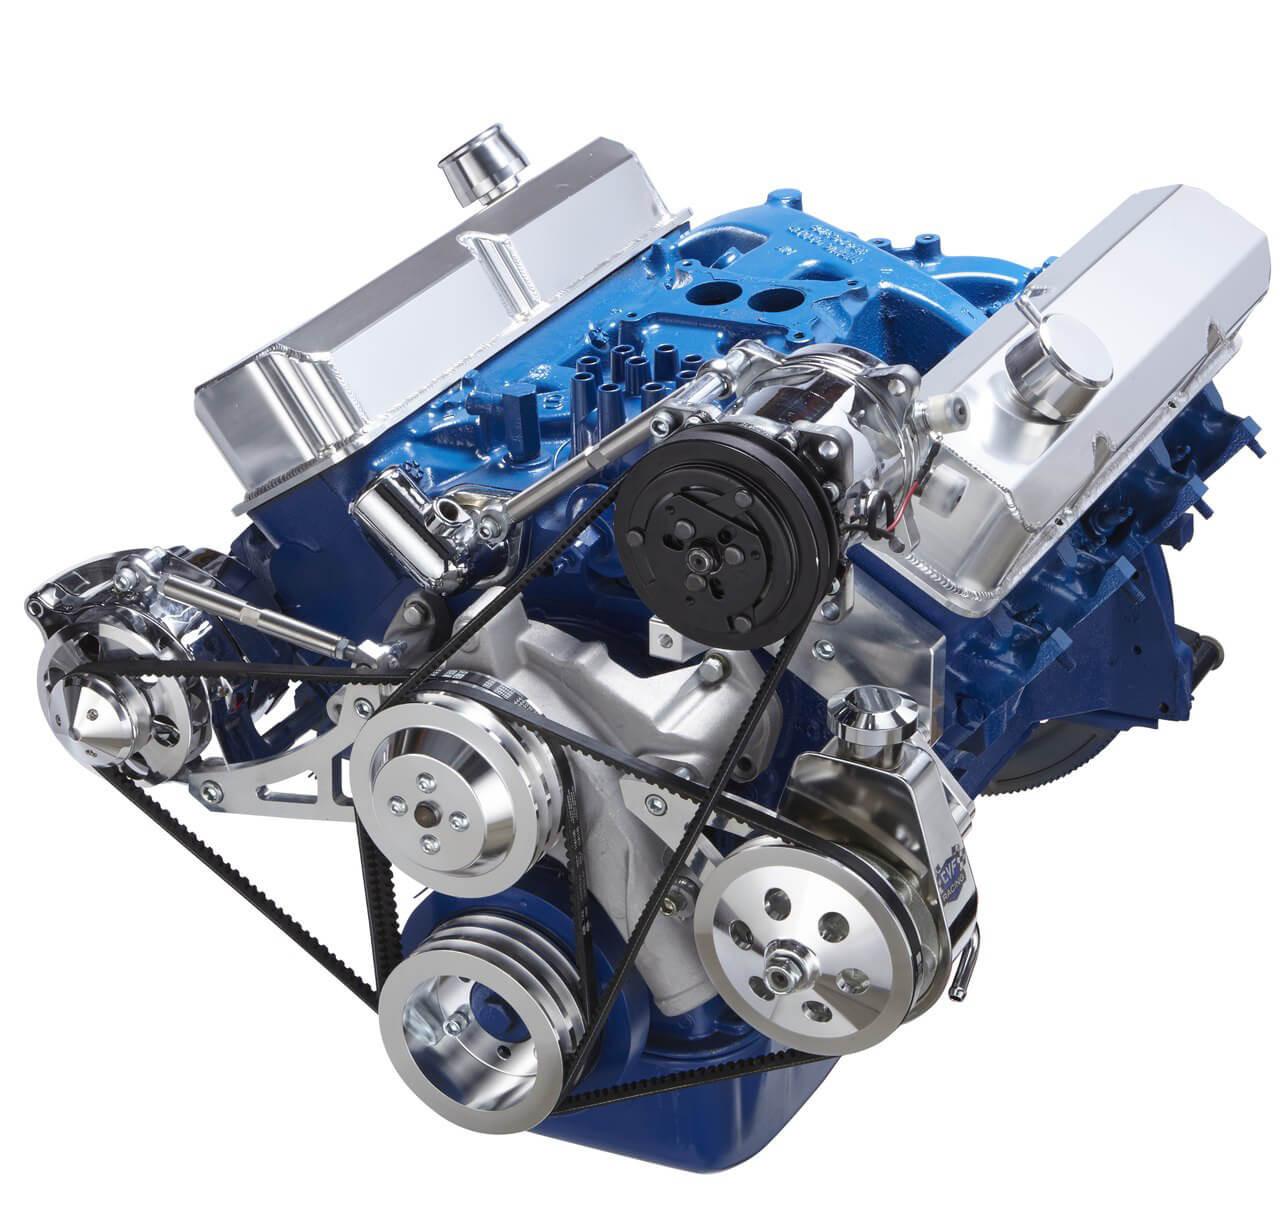 medium resolution of fe 390 engine diagrams on diagram data schemaford 390 fe engine v belt pulley system sanden